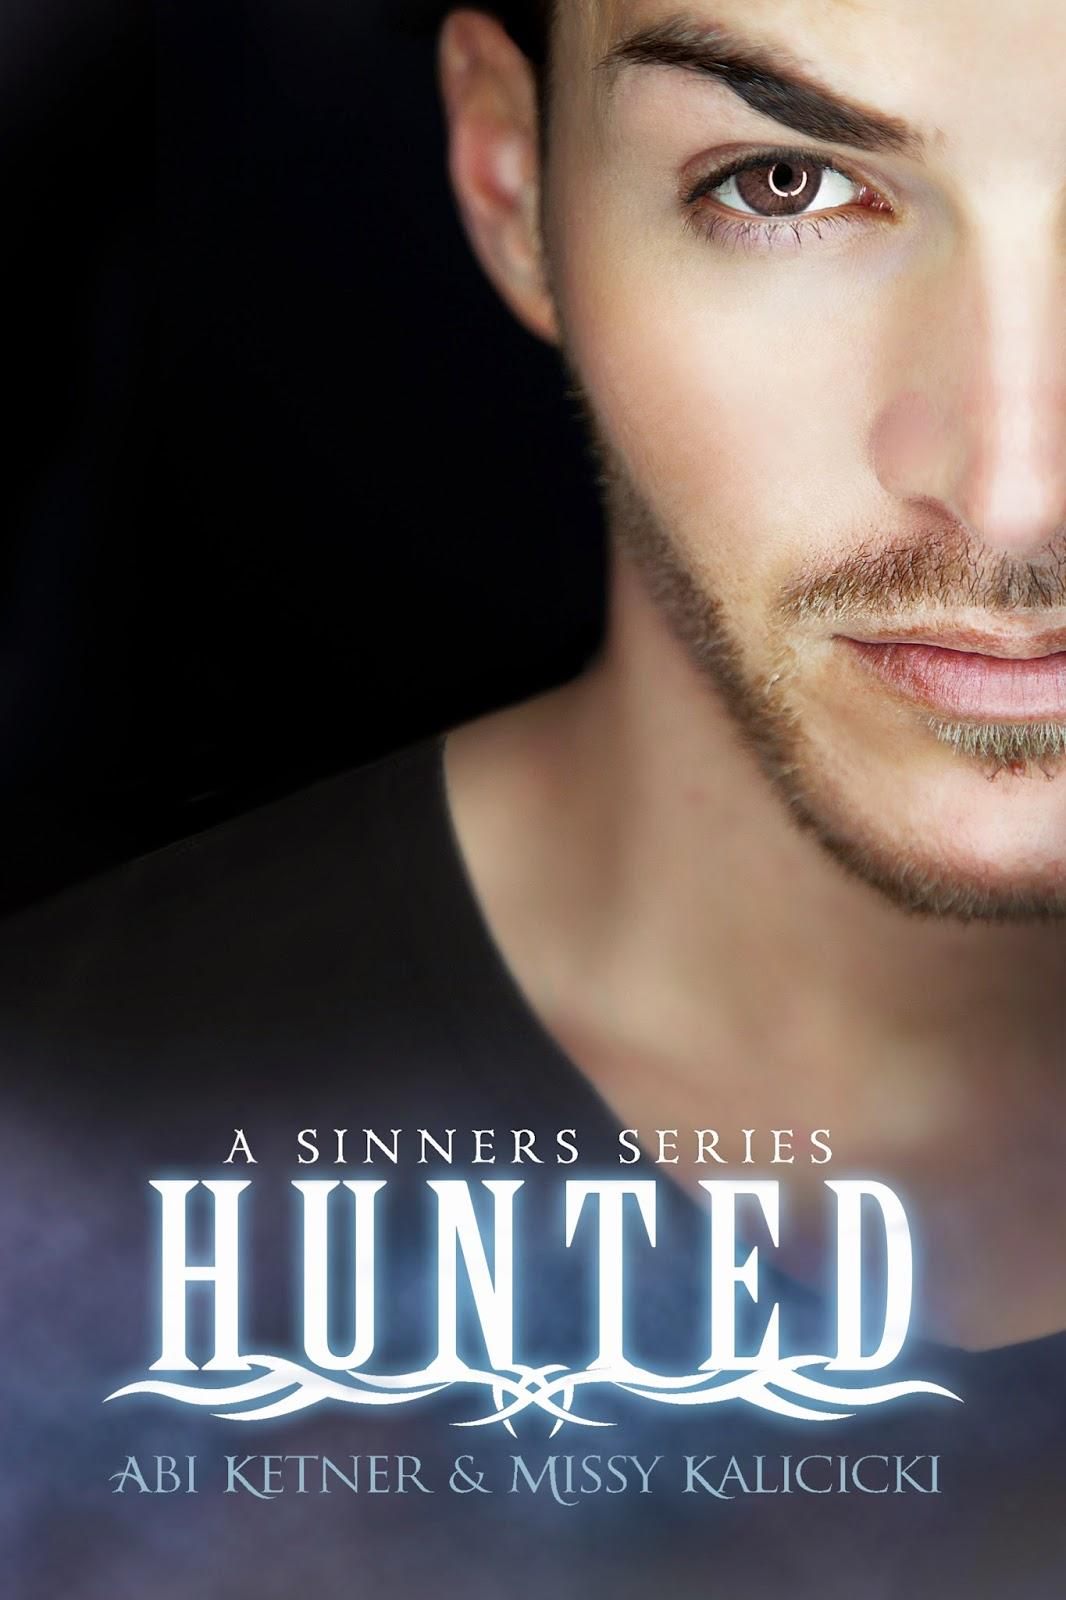 Cover Reveal: Hunted by Abi Ketner & Missy Kalicicki